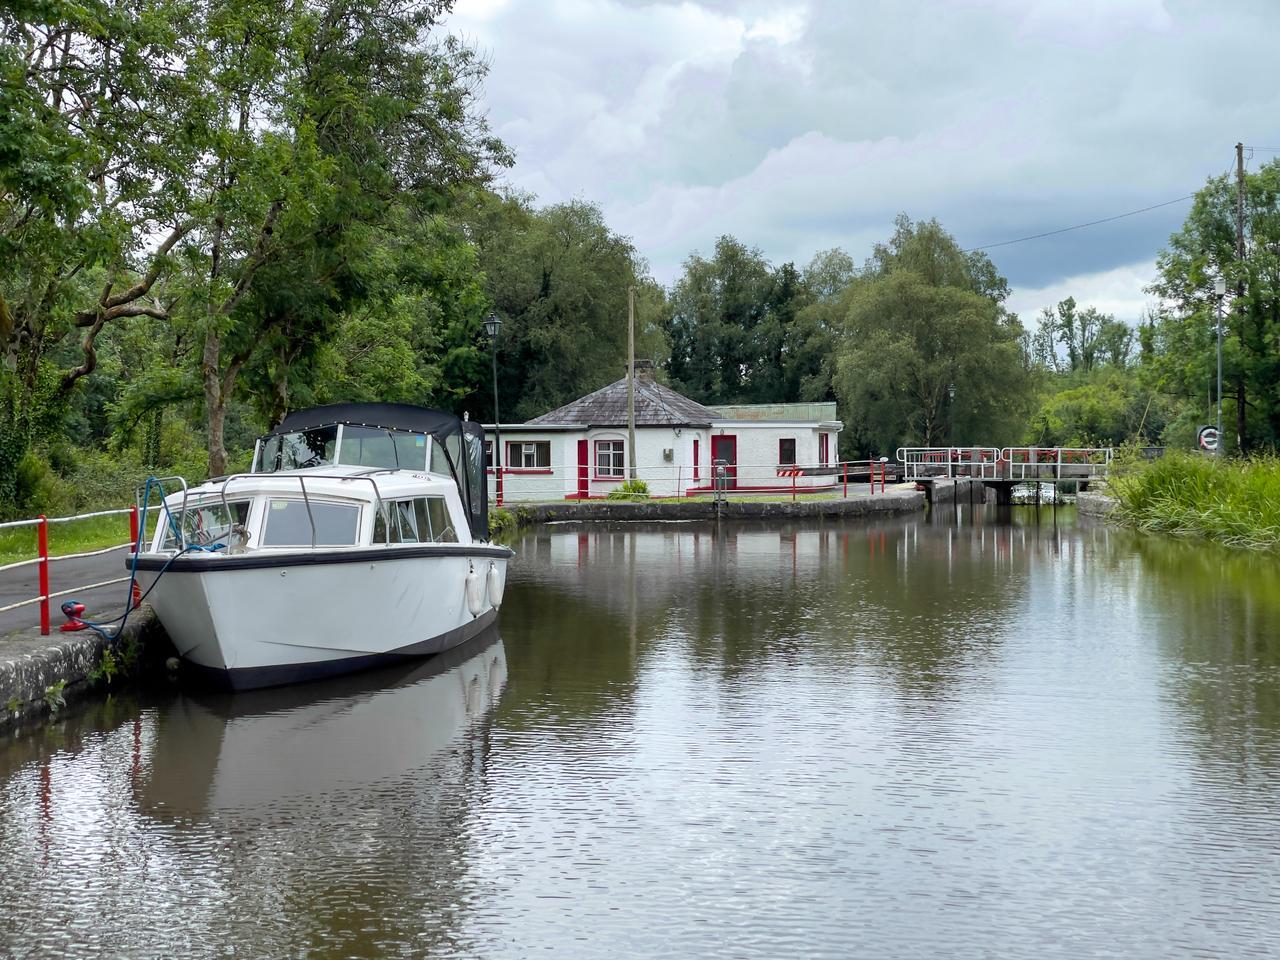 Water, Boat, Sky, Cloud, Plant, Watercraft, Vehicle, Tree, Lake, Building